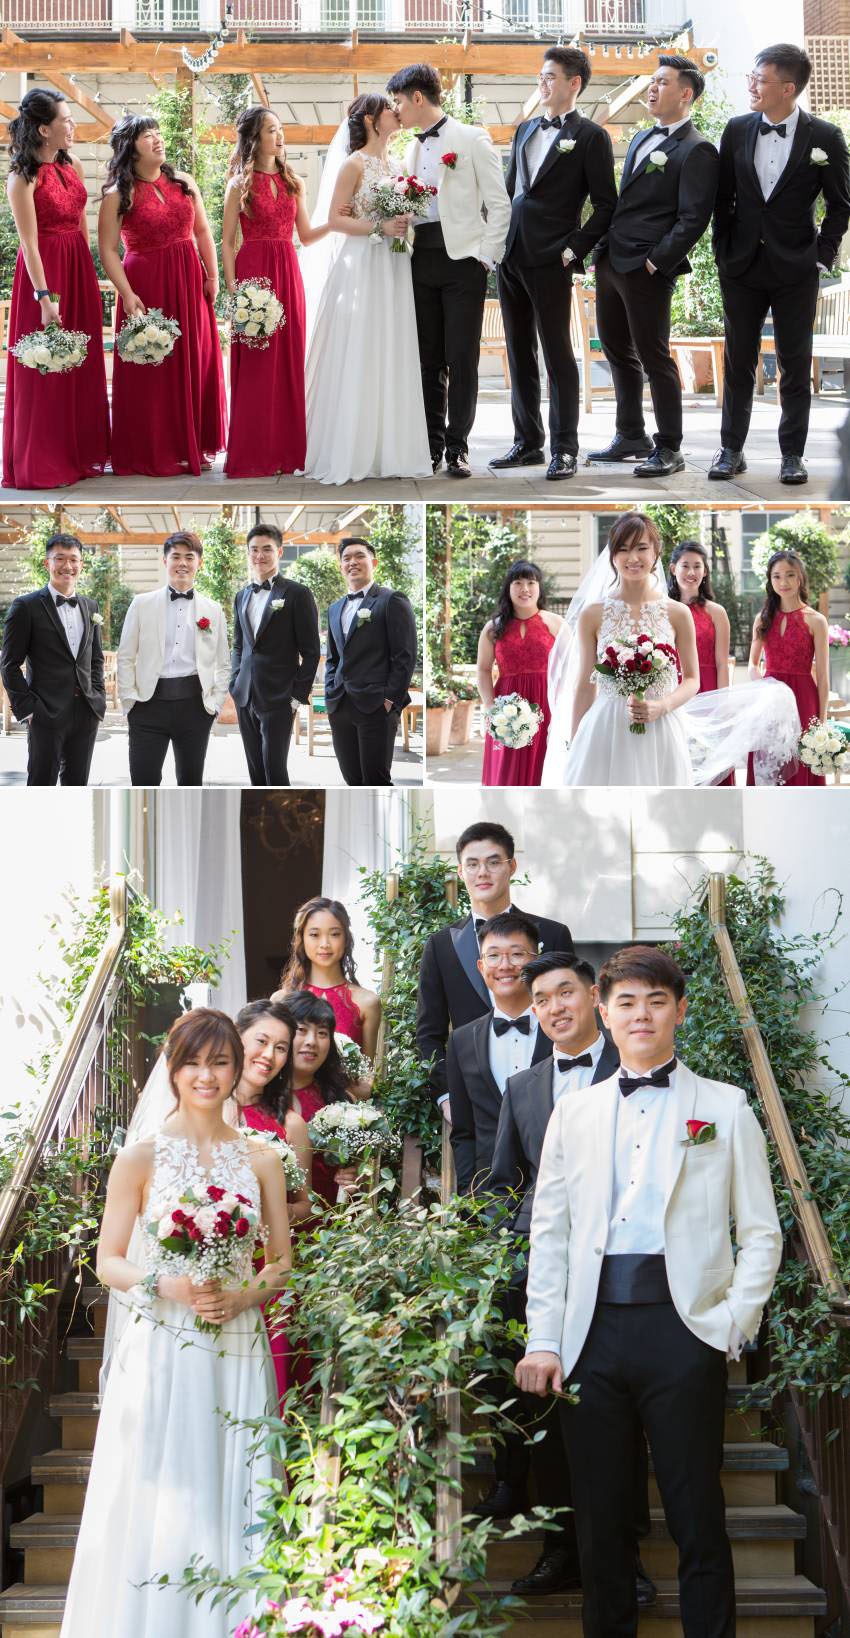 A Wedding at the Langham 06